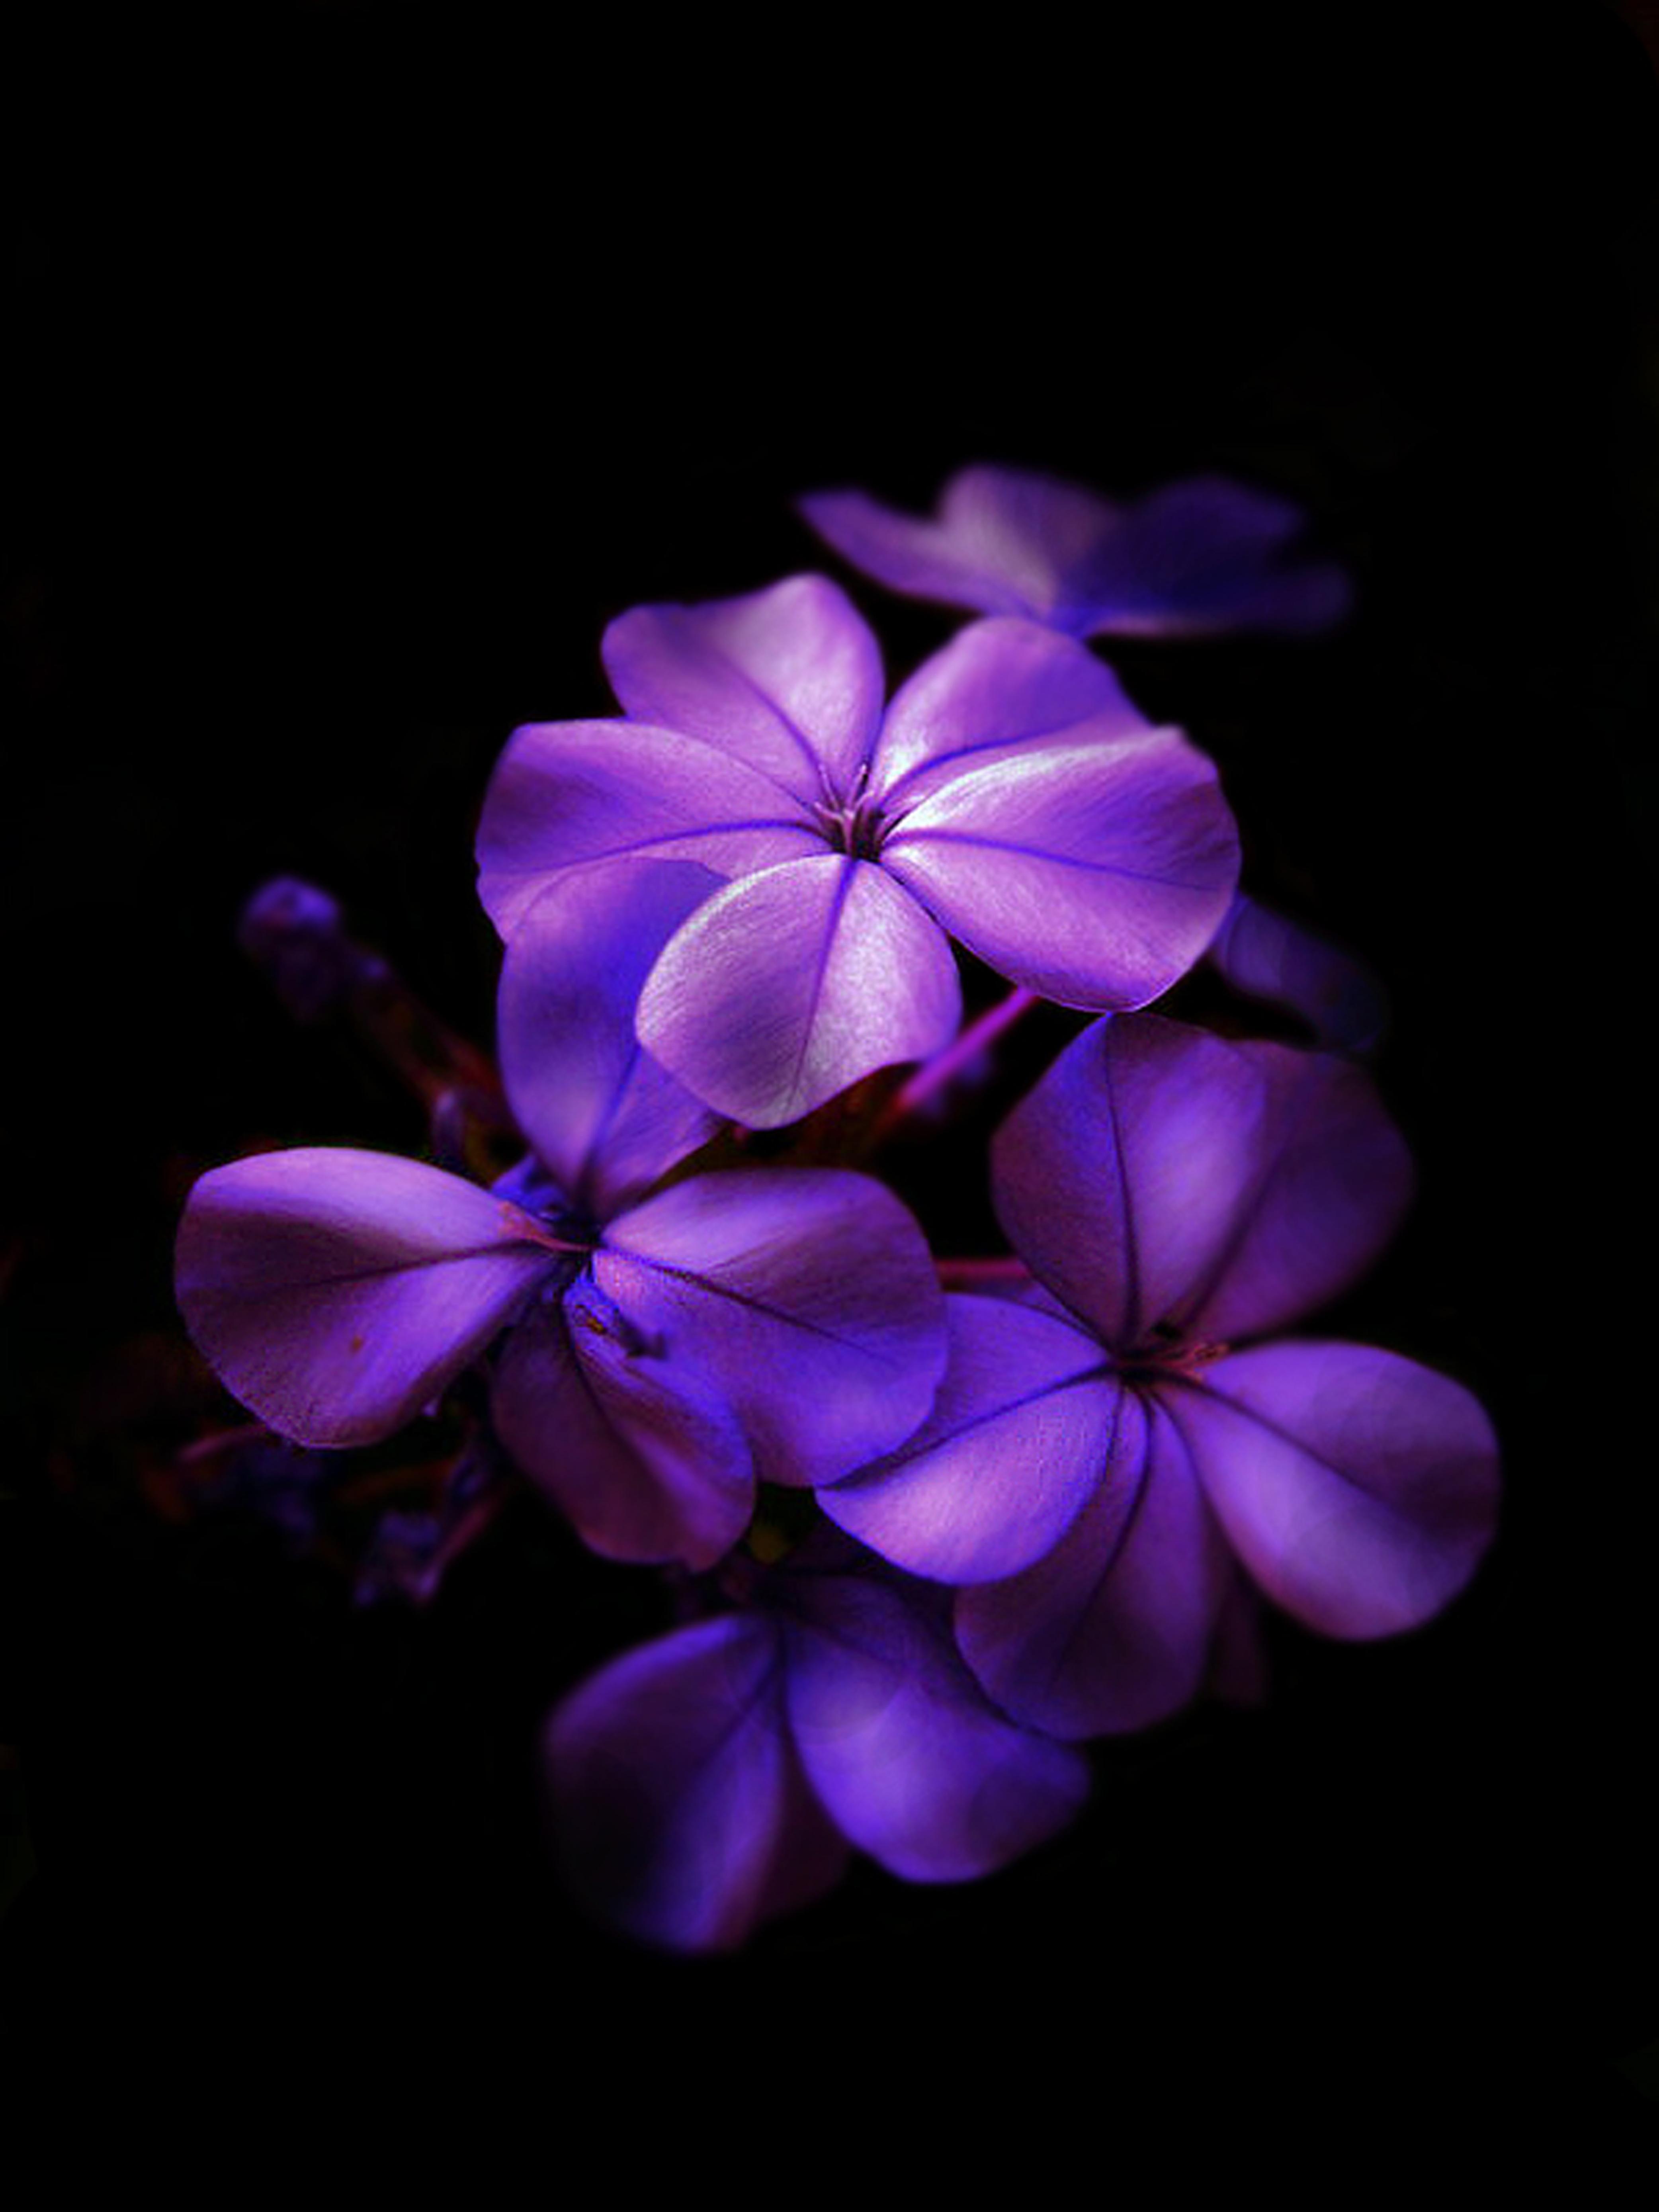 Beautiful black purple flower wallpaper high definitions wallpapers black and purple flowers mightylinksfo